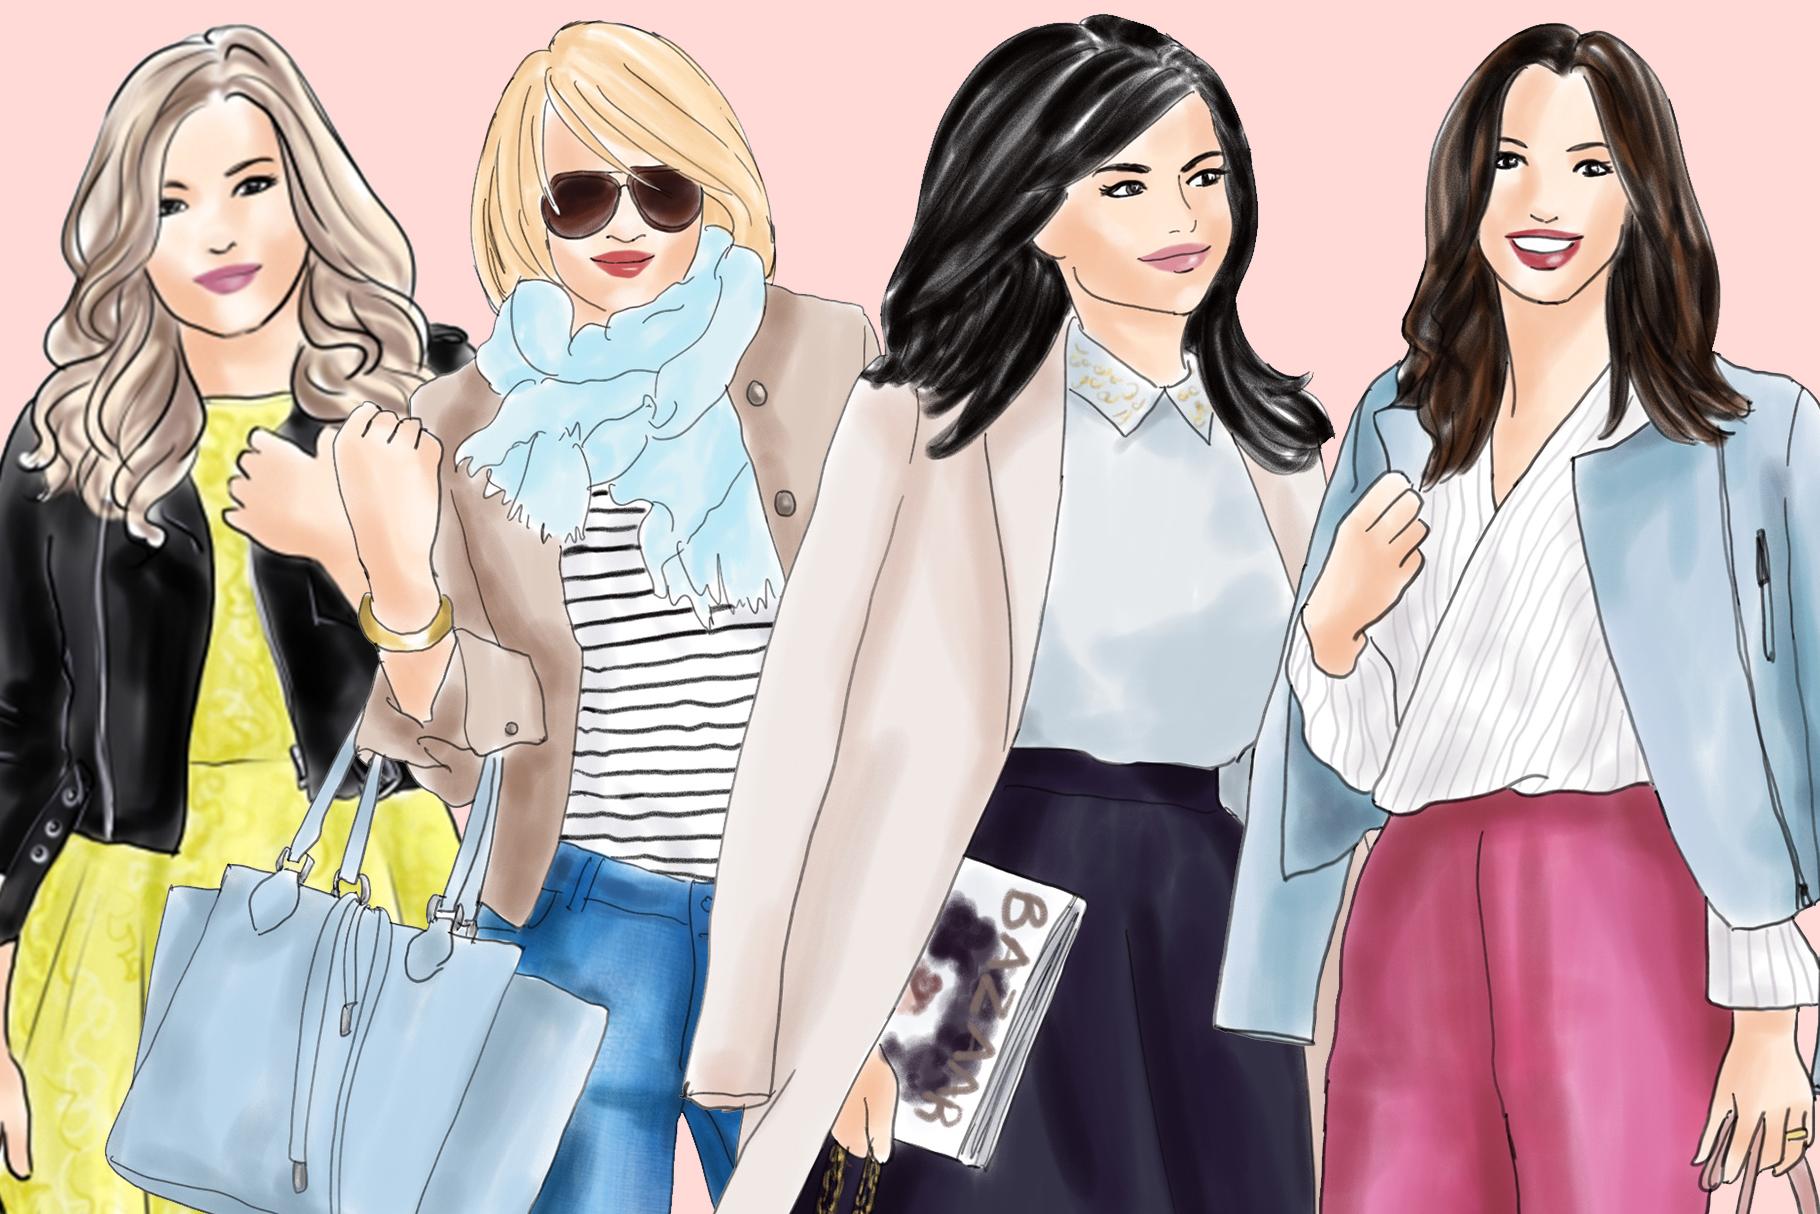 Fashion illustration clipart - Fashion Girls 21 - Light Skin example image 3